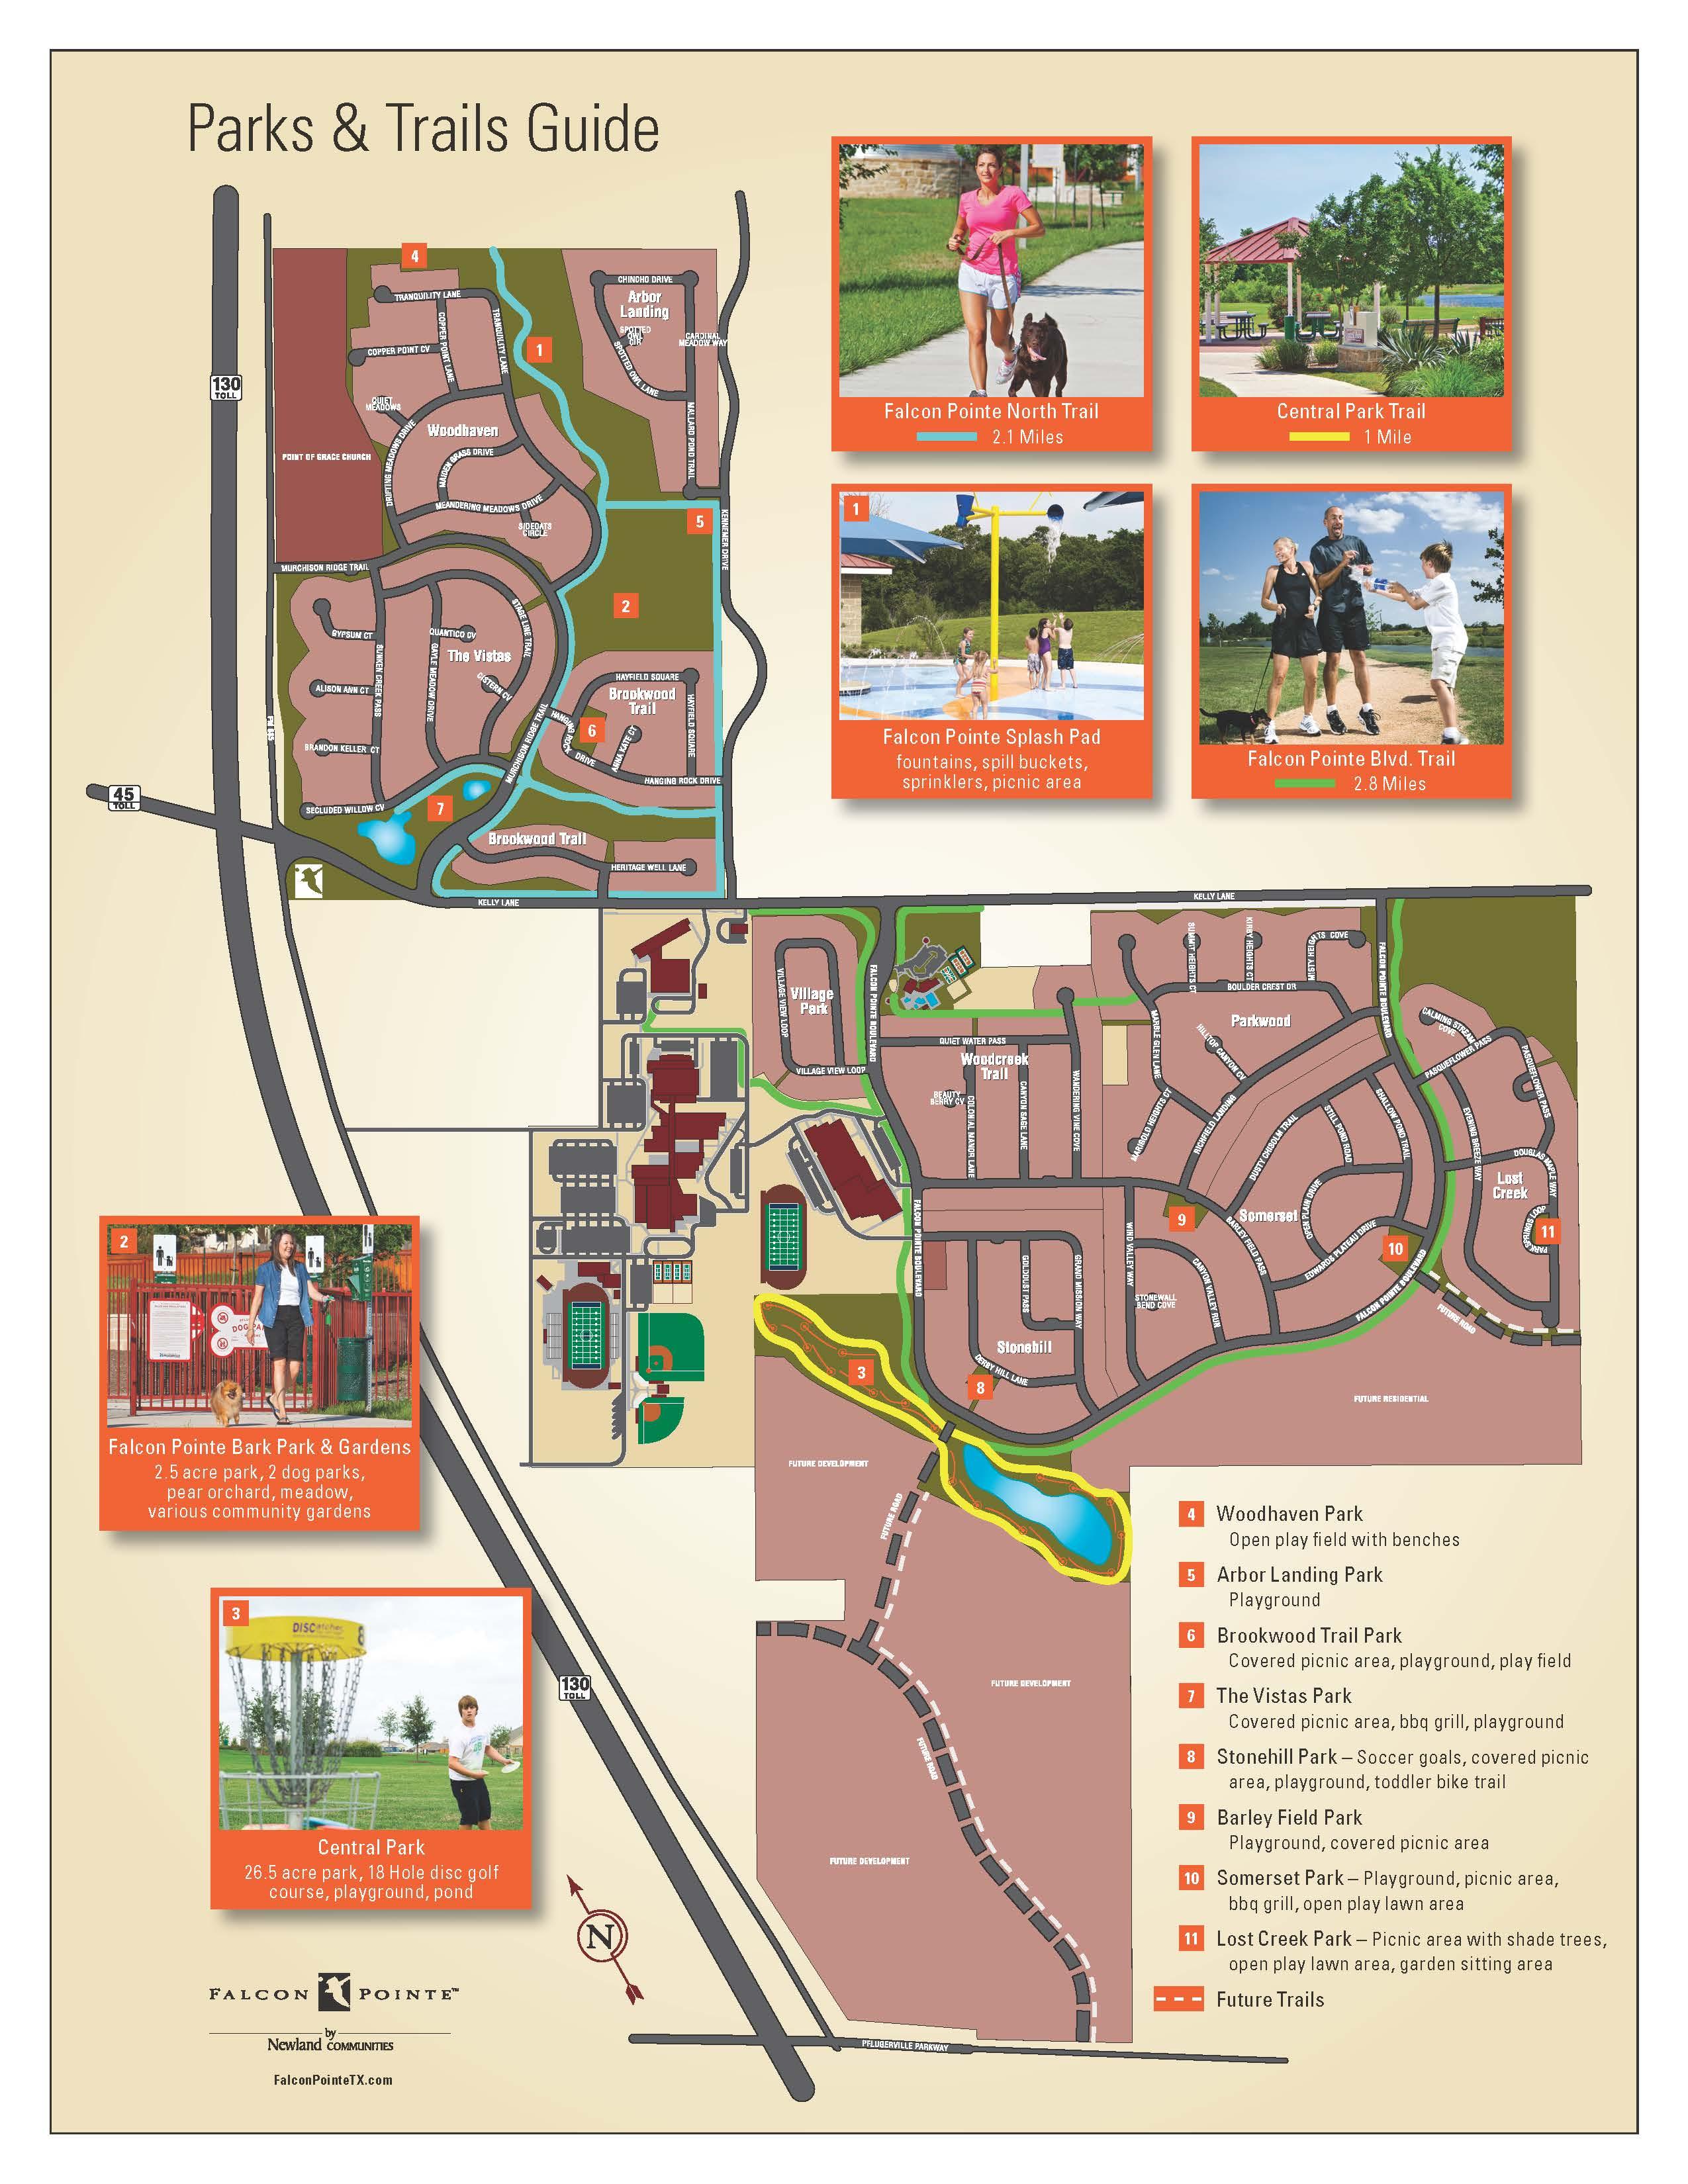 falcon pointe amenity map